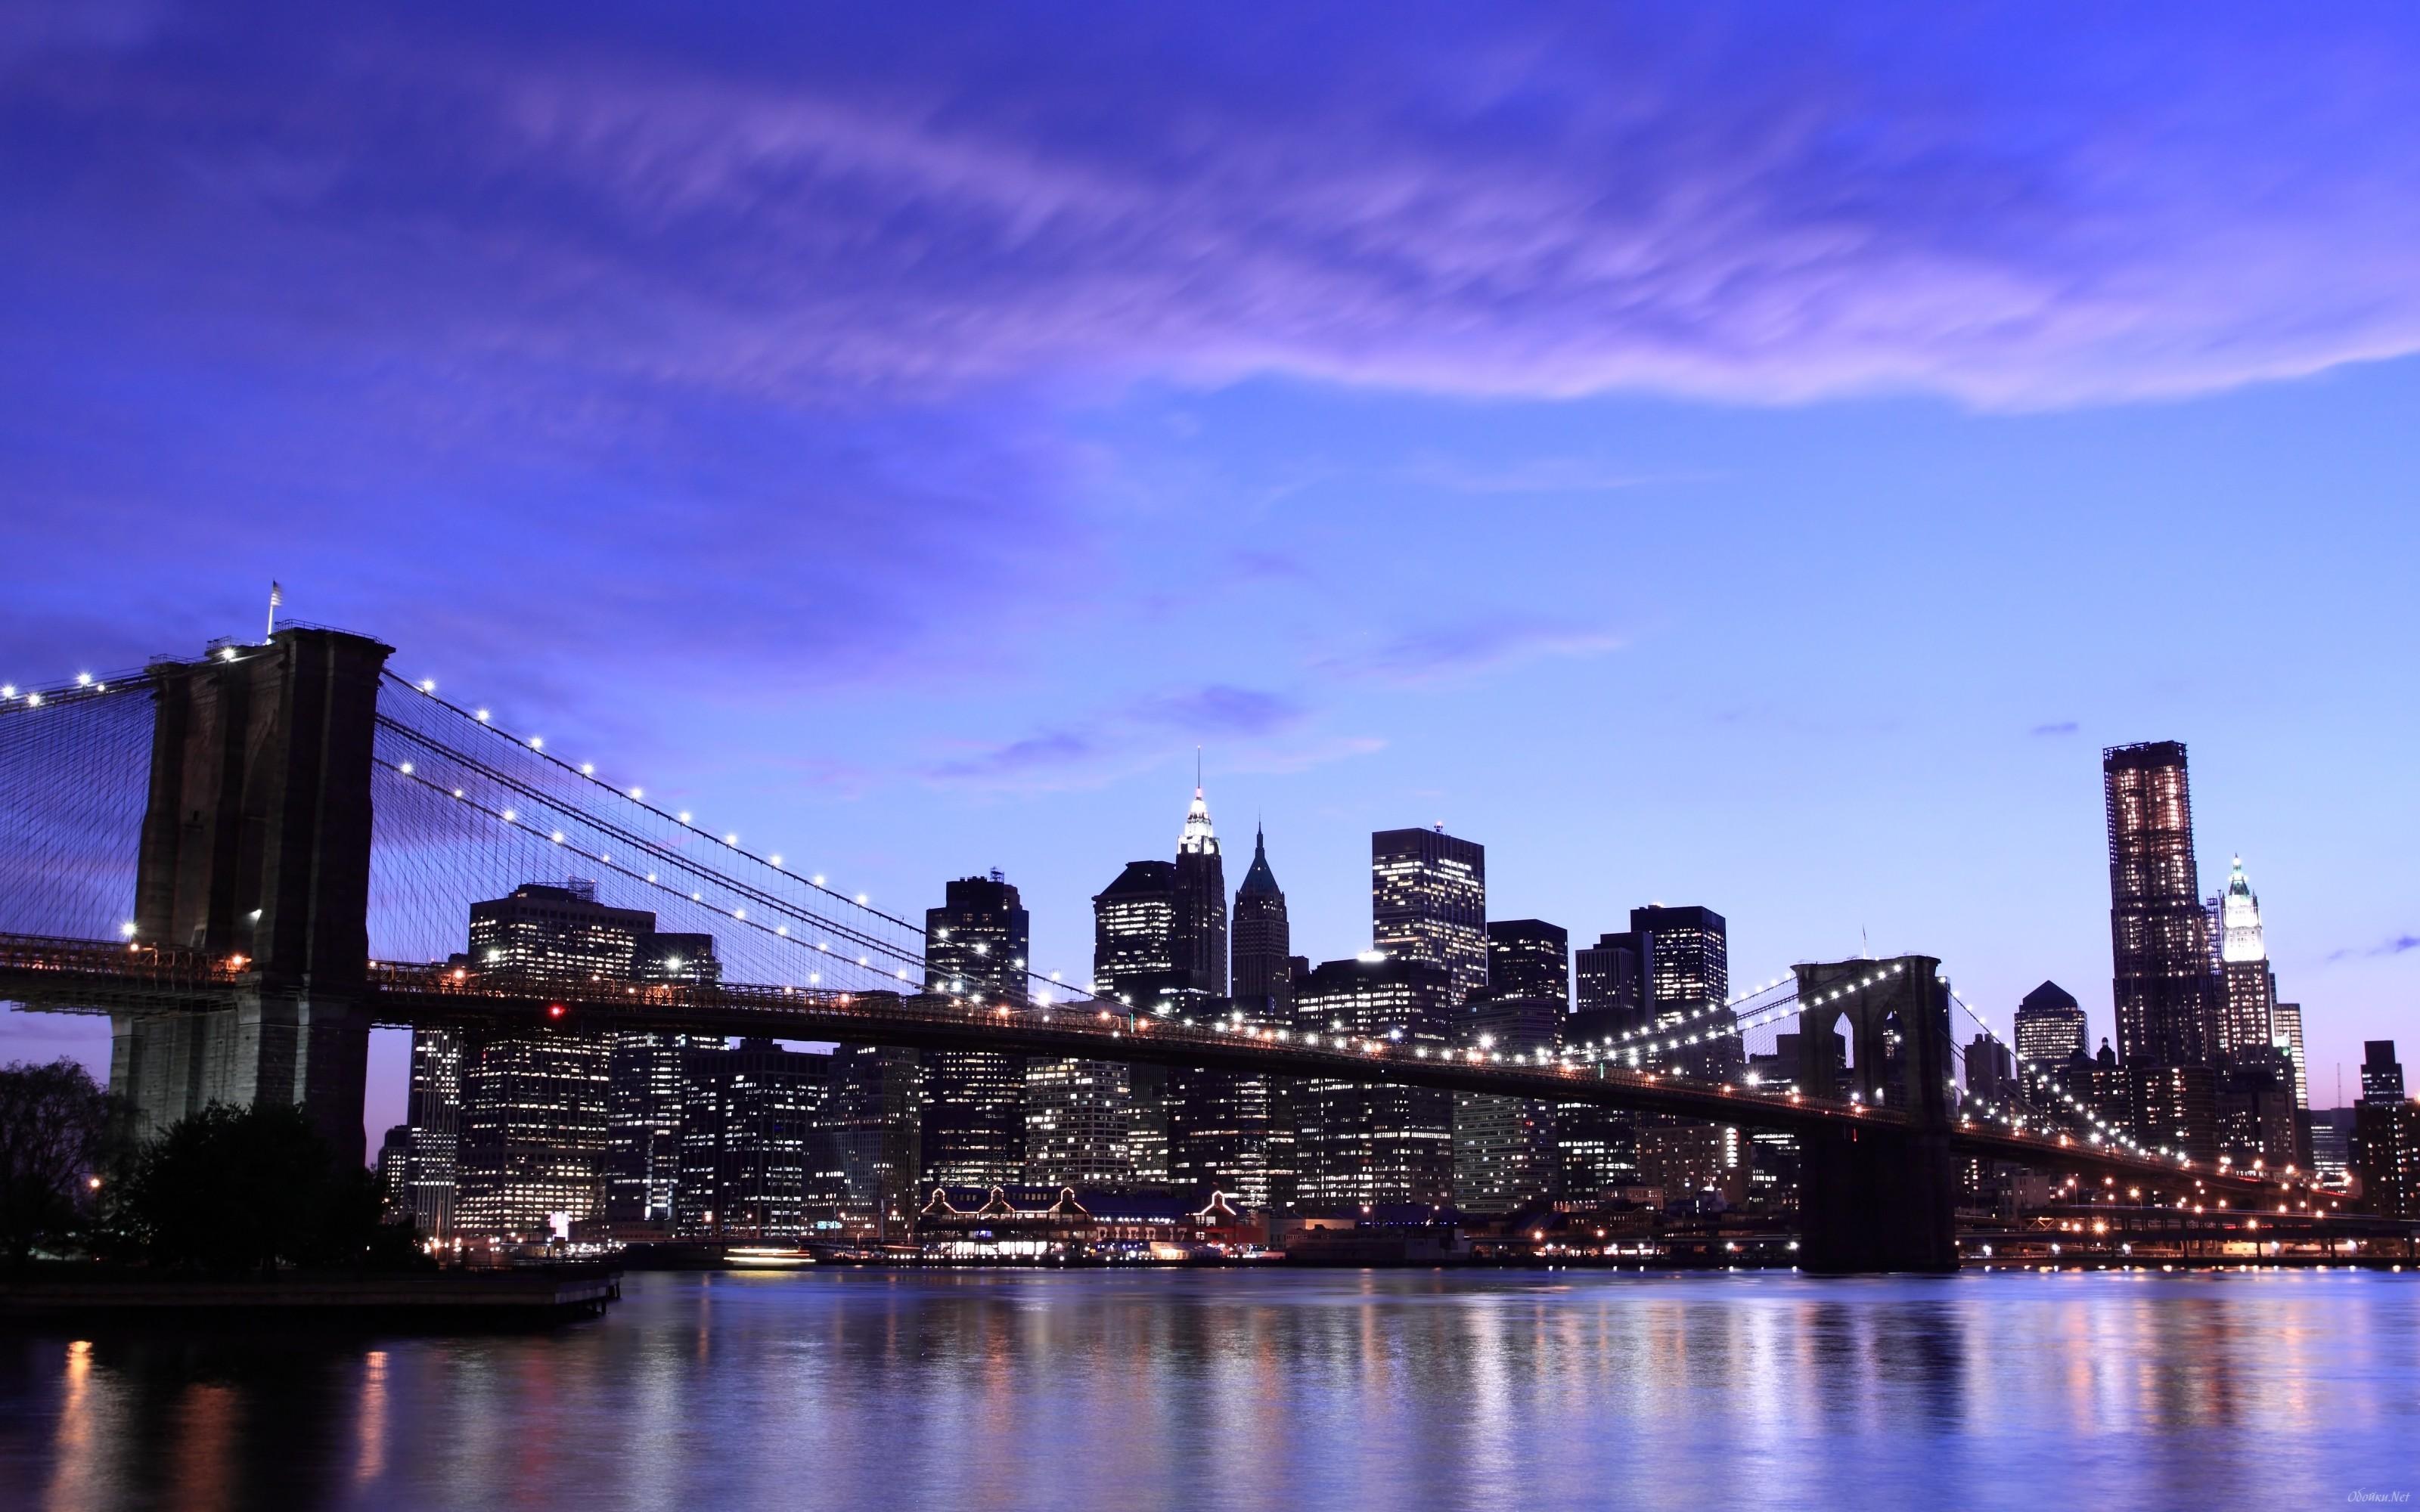 New York At Night Wallpaper Desktop Background , 5 / 5 ( 1 votes )